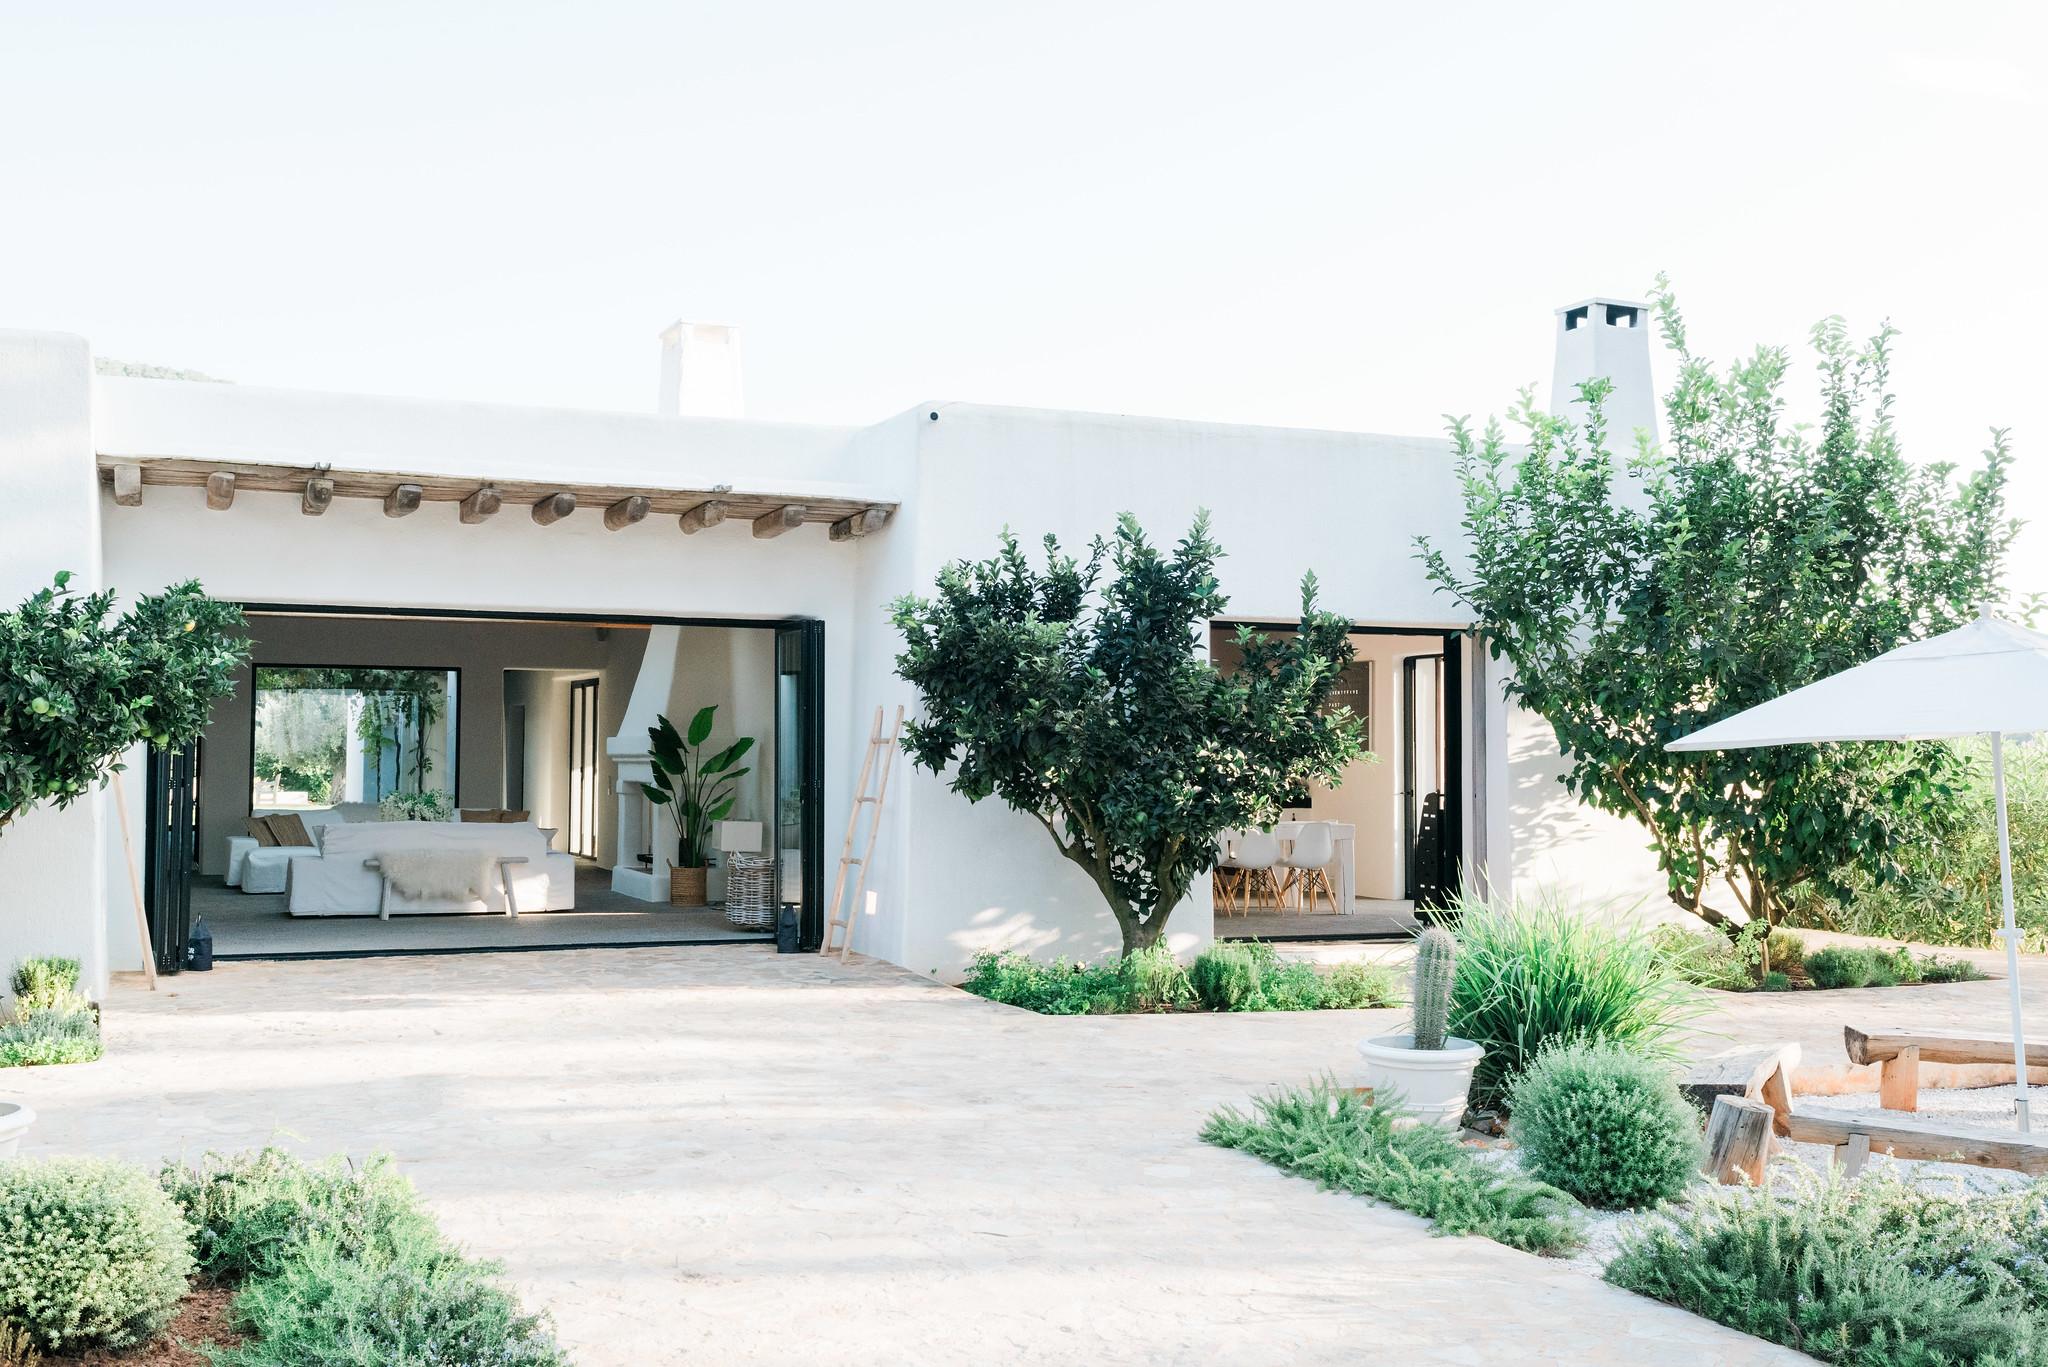 https://www.white-ibiza.com/wp-content/uploads/2020/05/white-ibiza-villas-can-terra-back.jpg